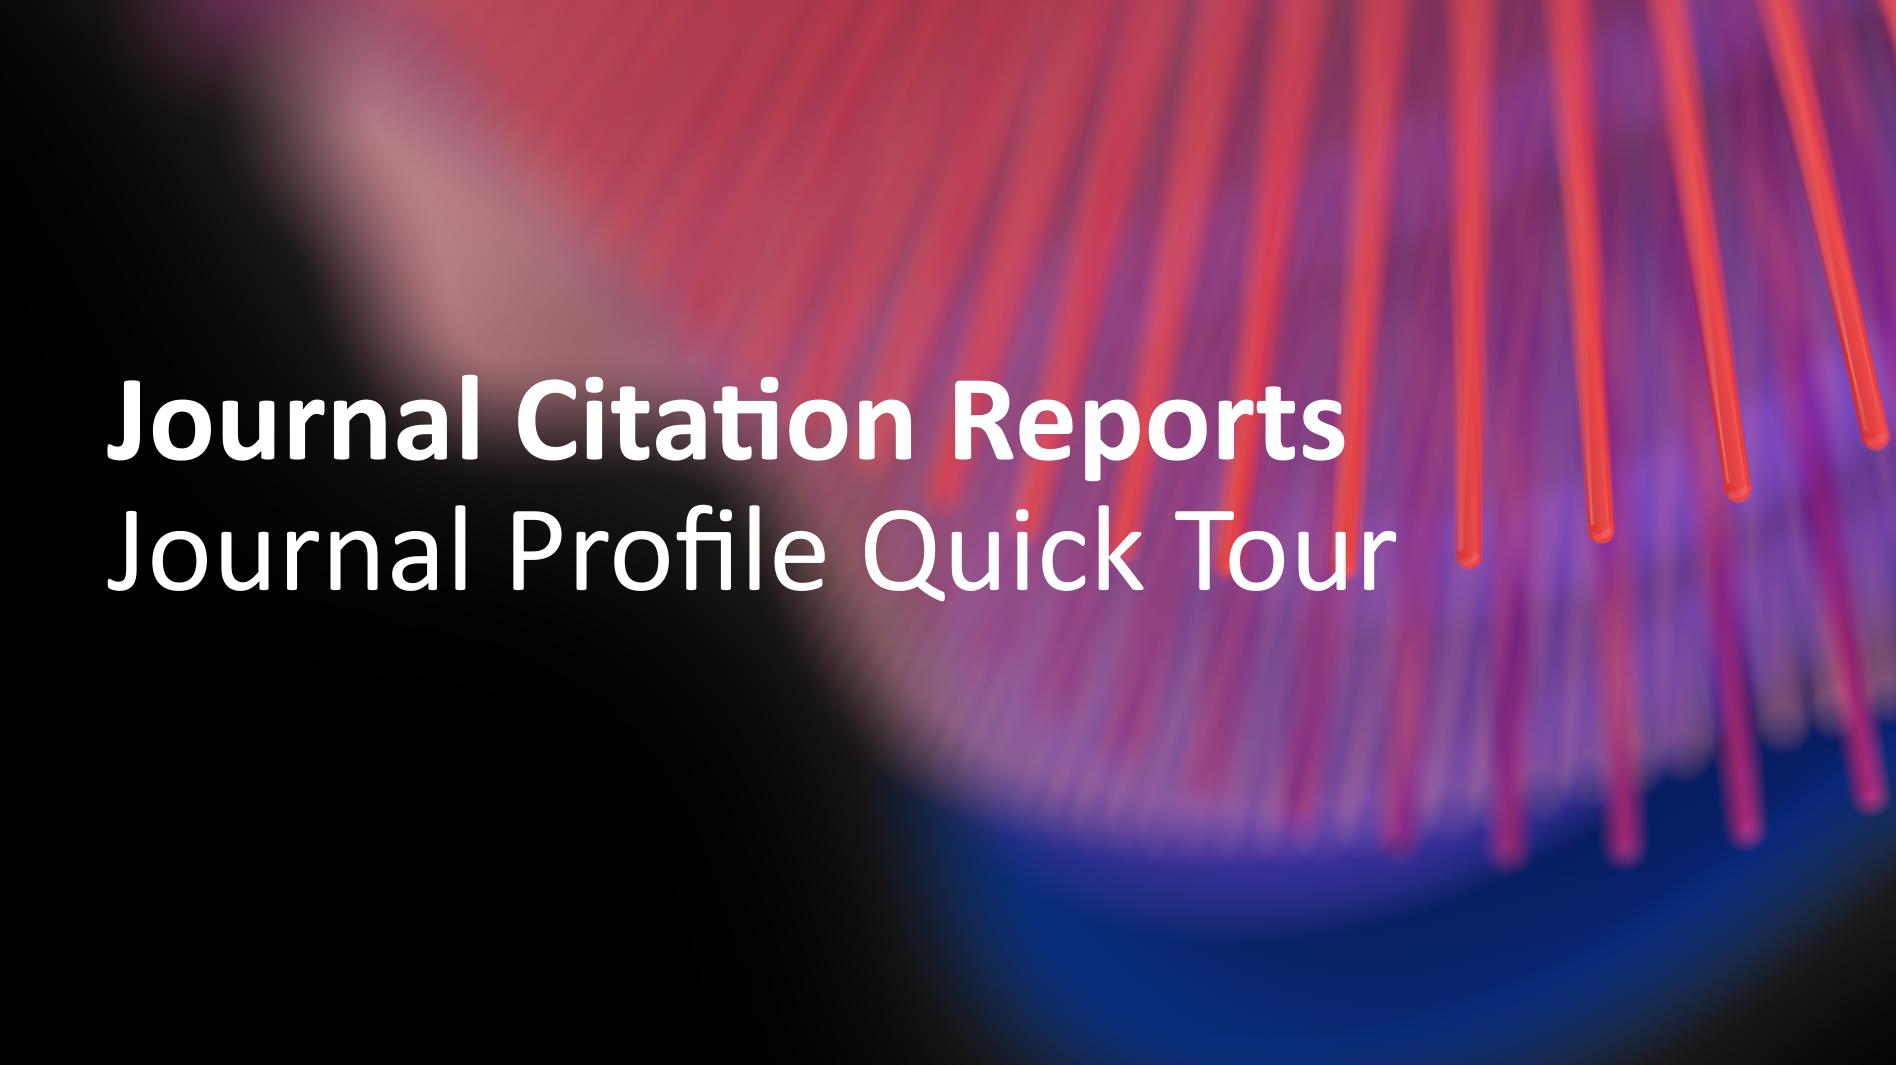 Journal Citation Reports: Journal Profile Quick Tour